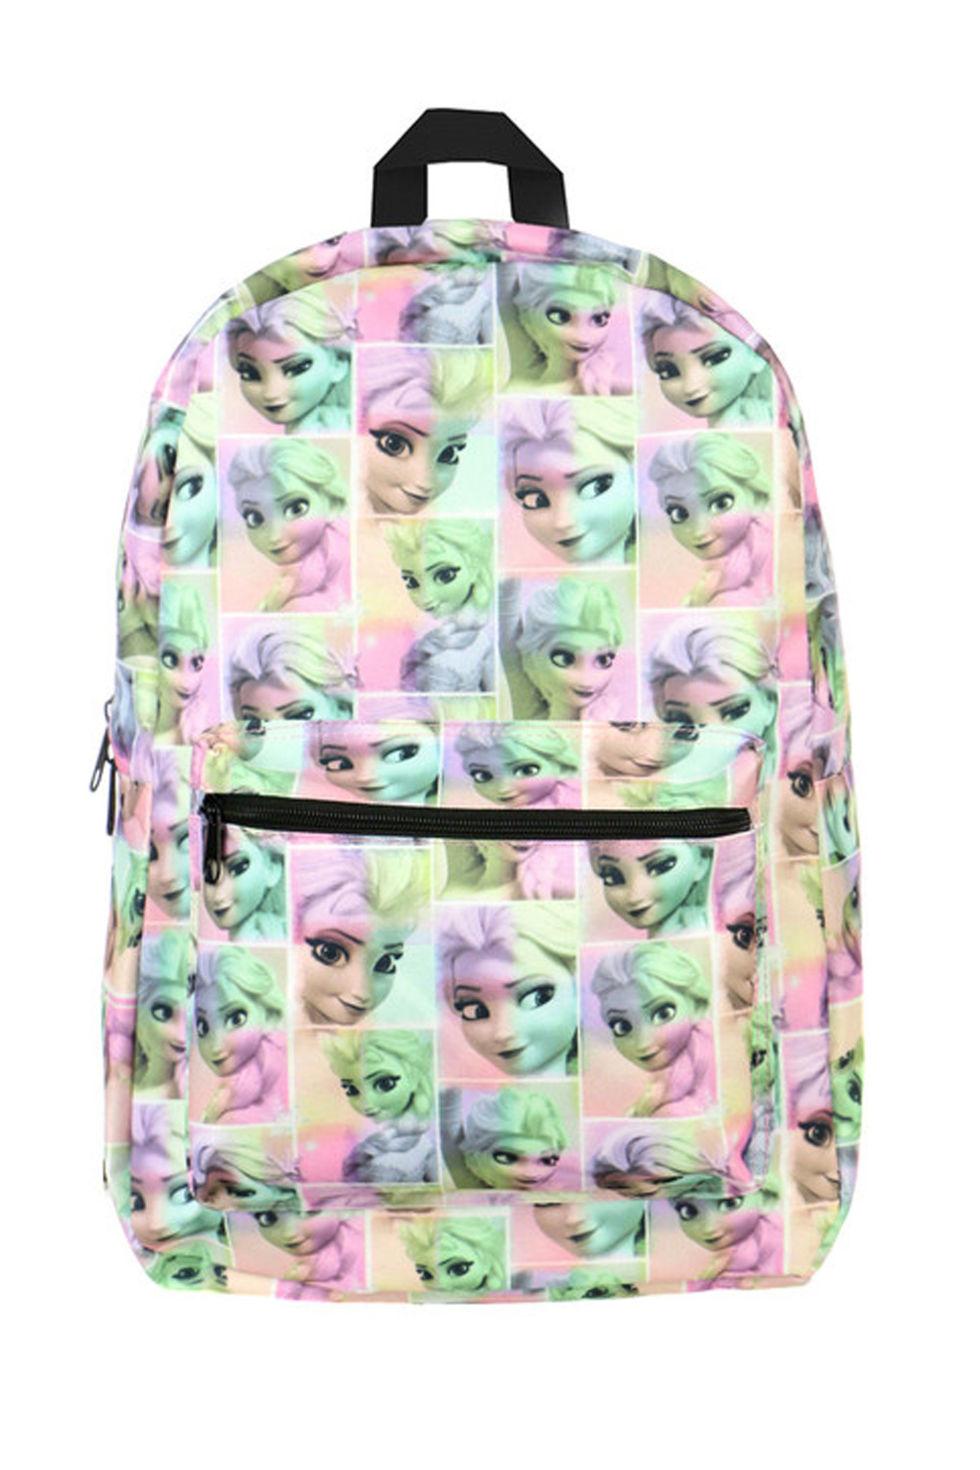 Cool Backpacks For Girls - Crazy Backpacks